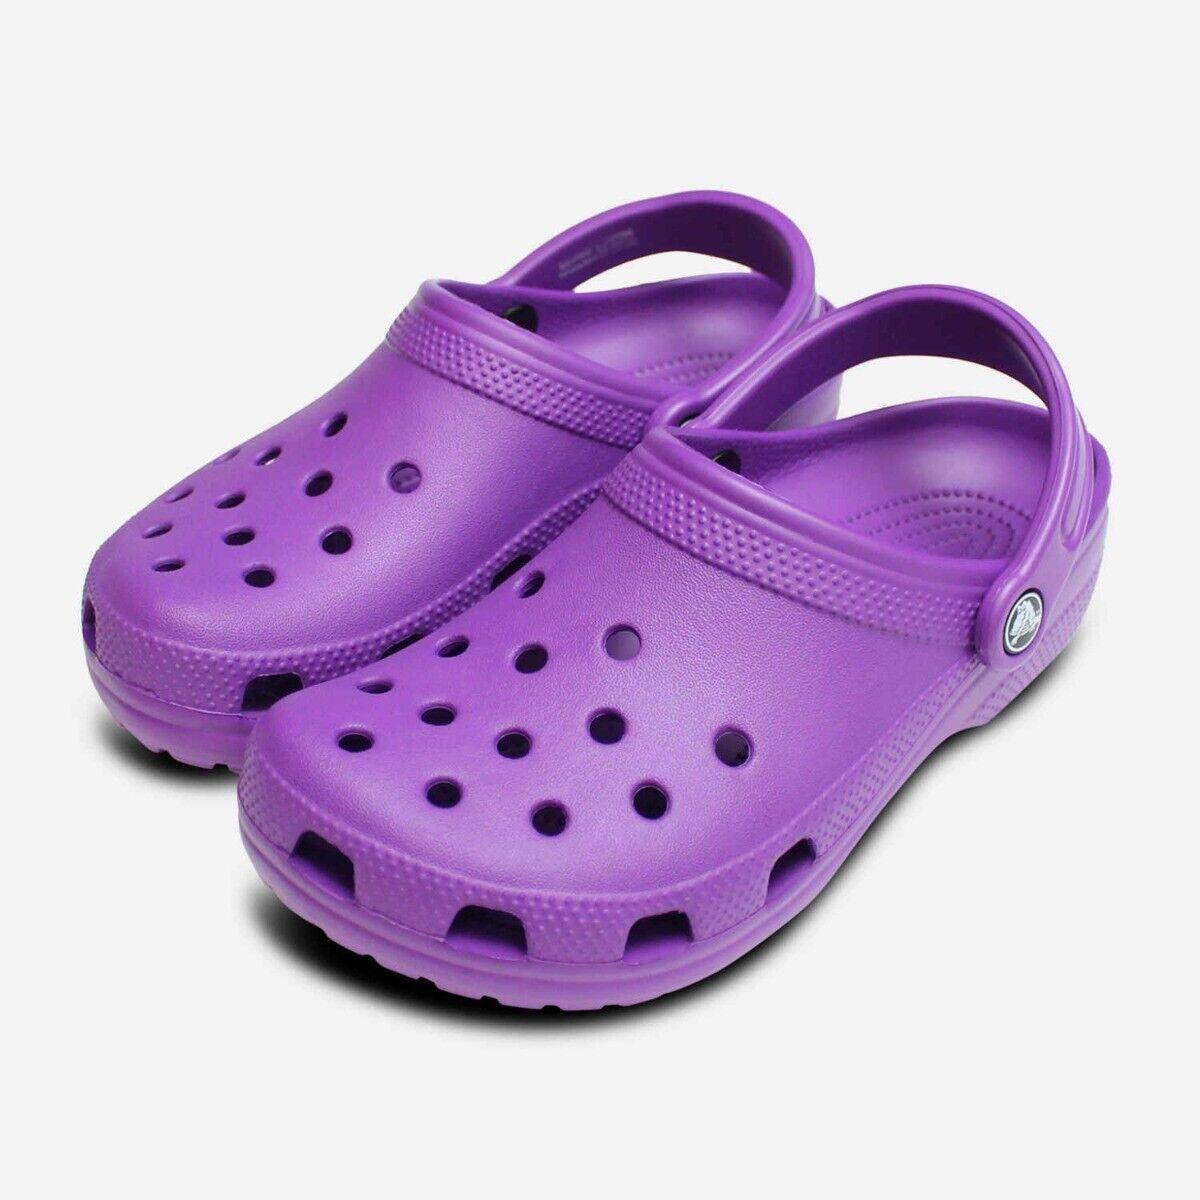 Crocs Womens Classic Clog in Neon Purple